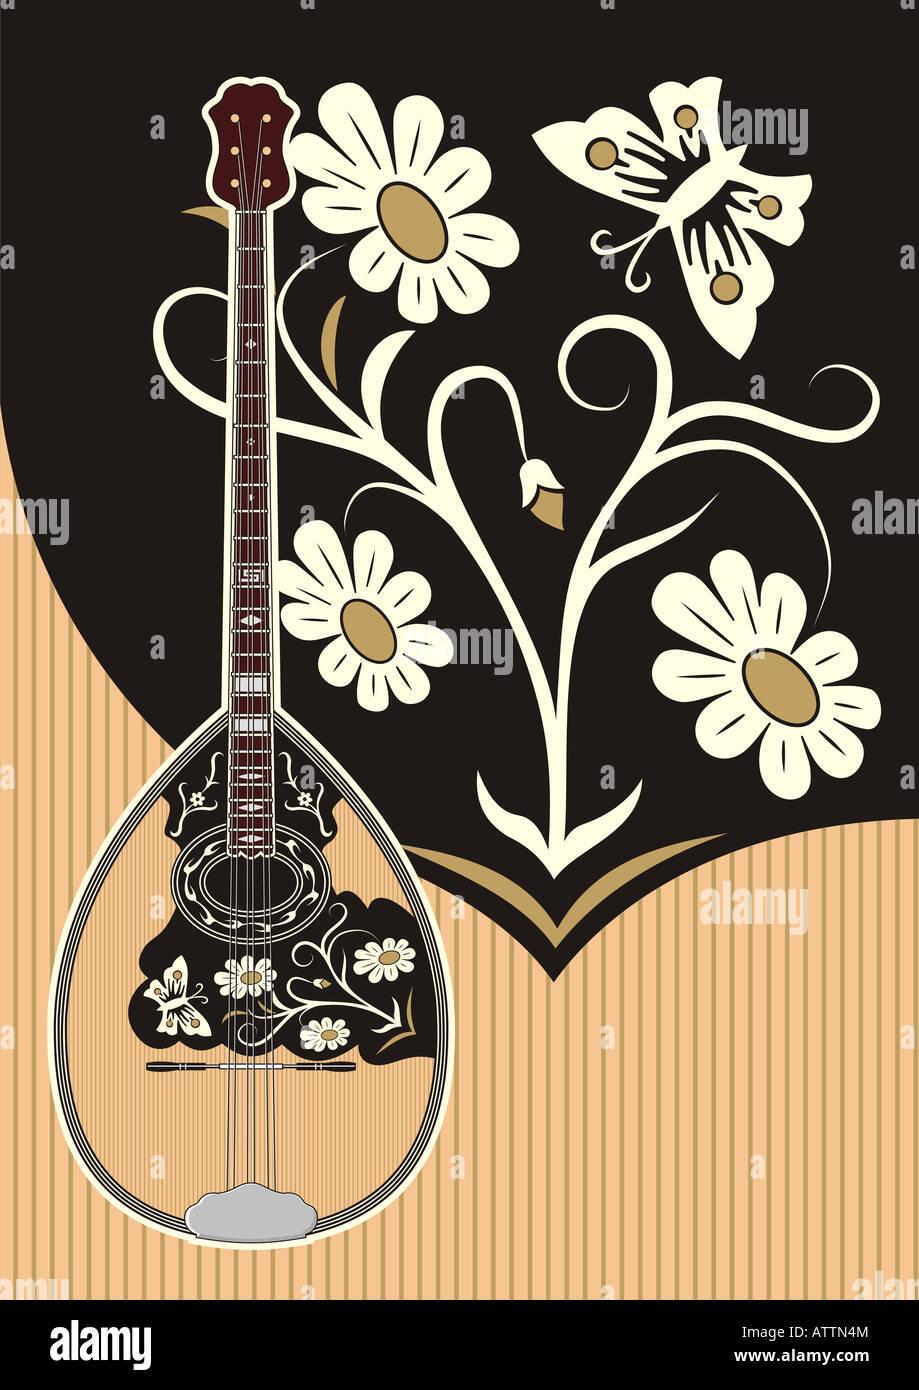 Bouzouki. Greek music string instrument having three pairs of strings (Trichordo) - Stock Image